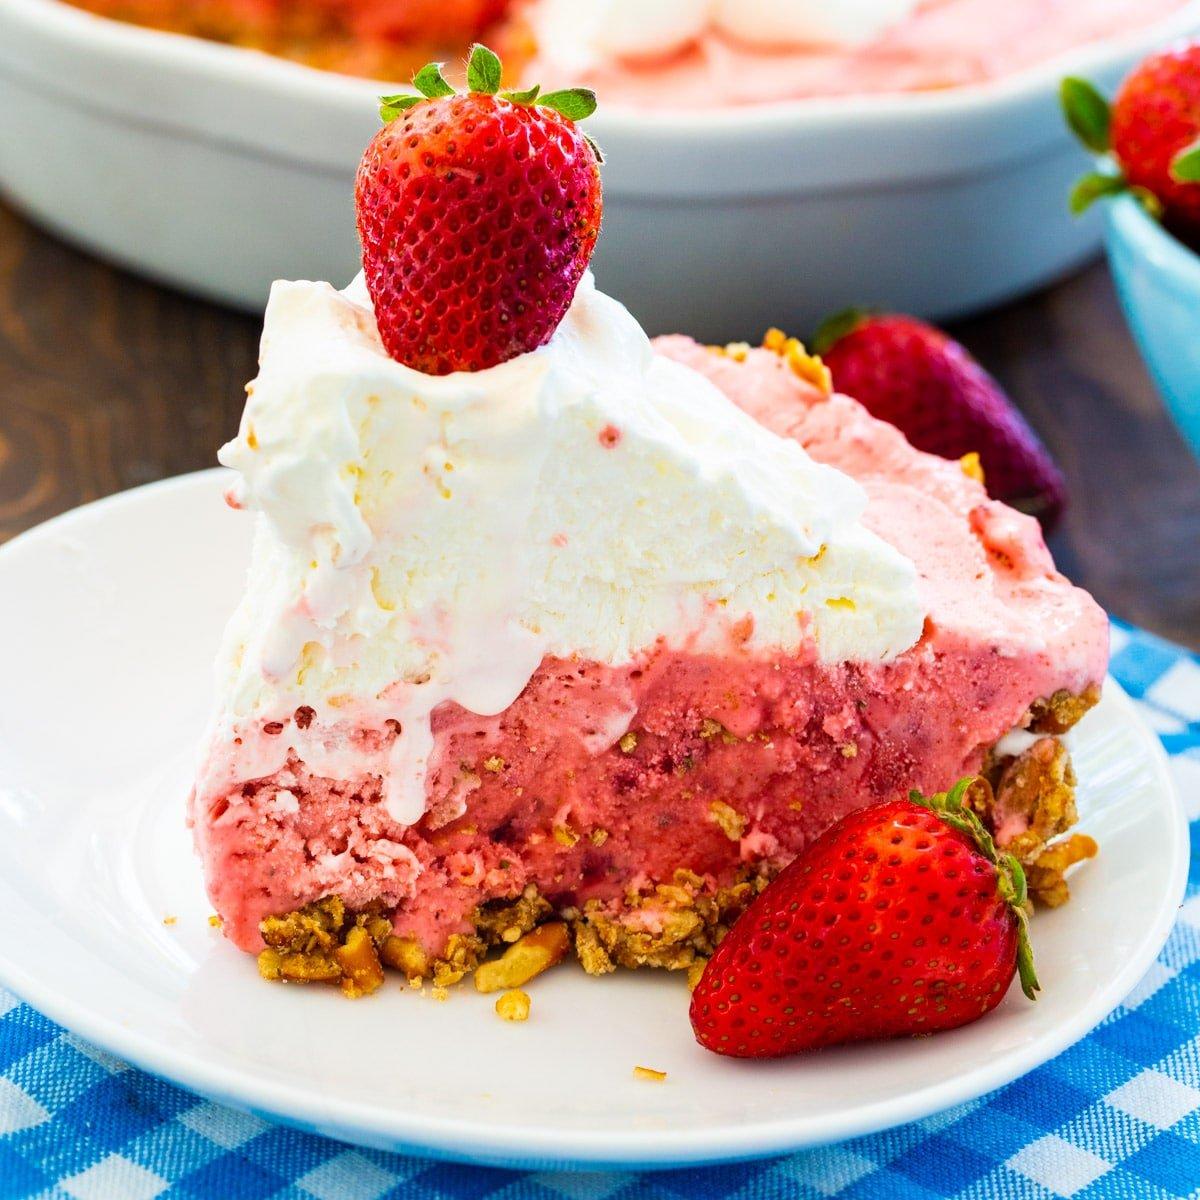 Slice of Strawberry Pretzel Icebox Pie on small white plate.